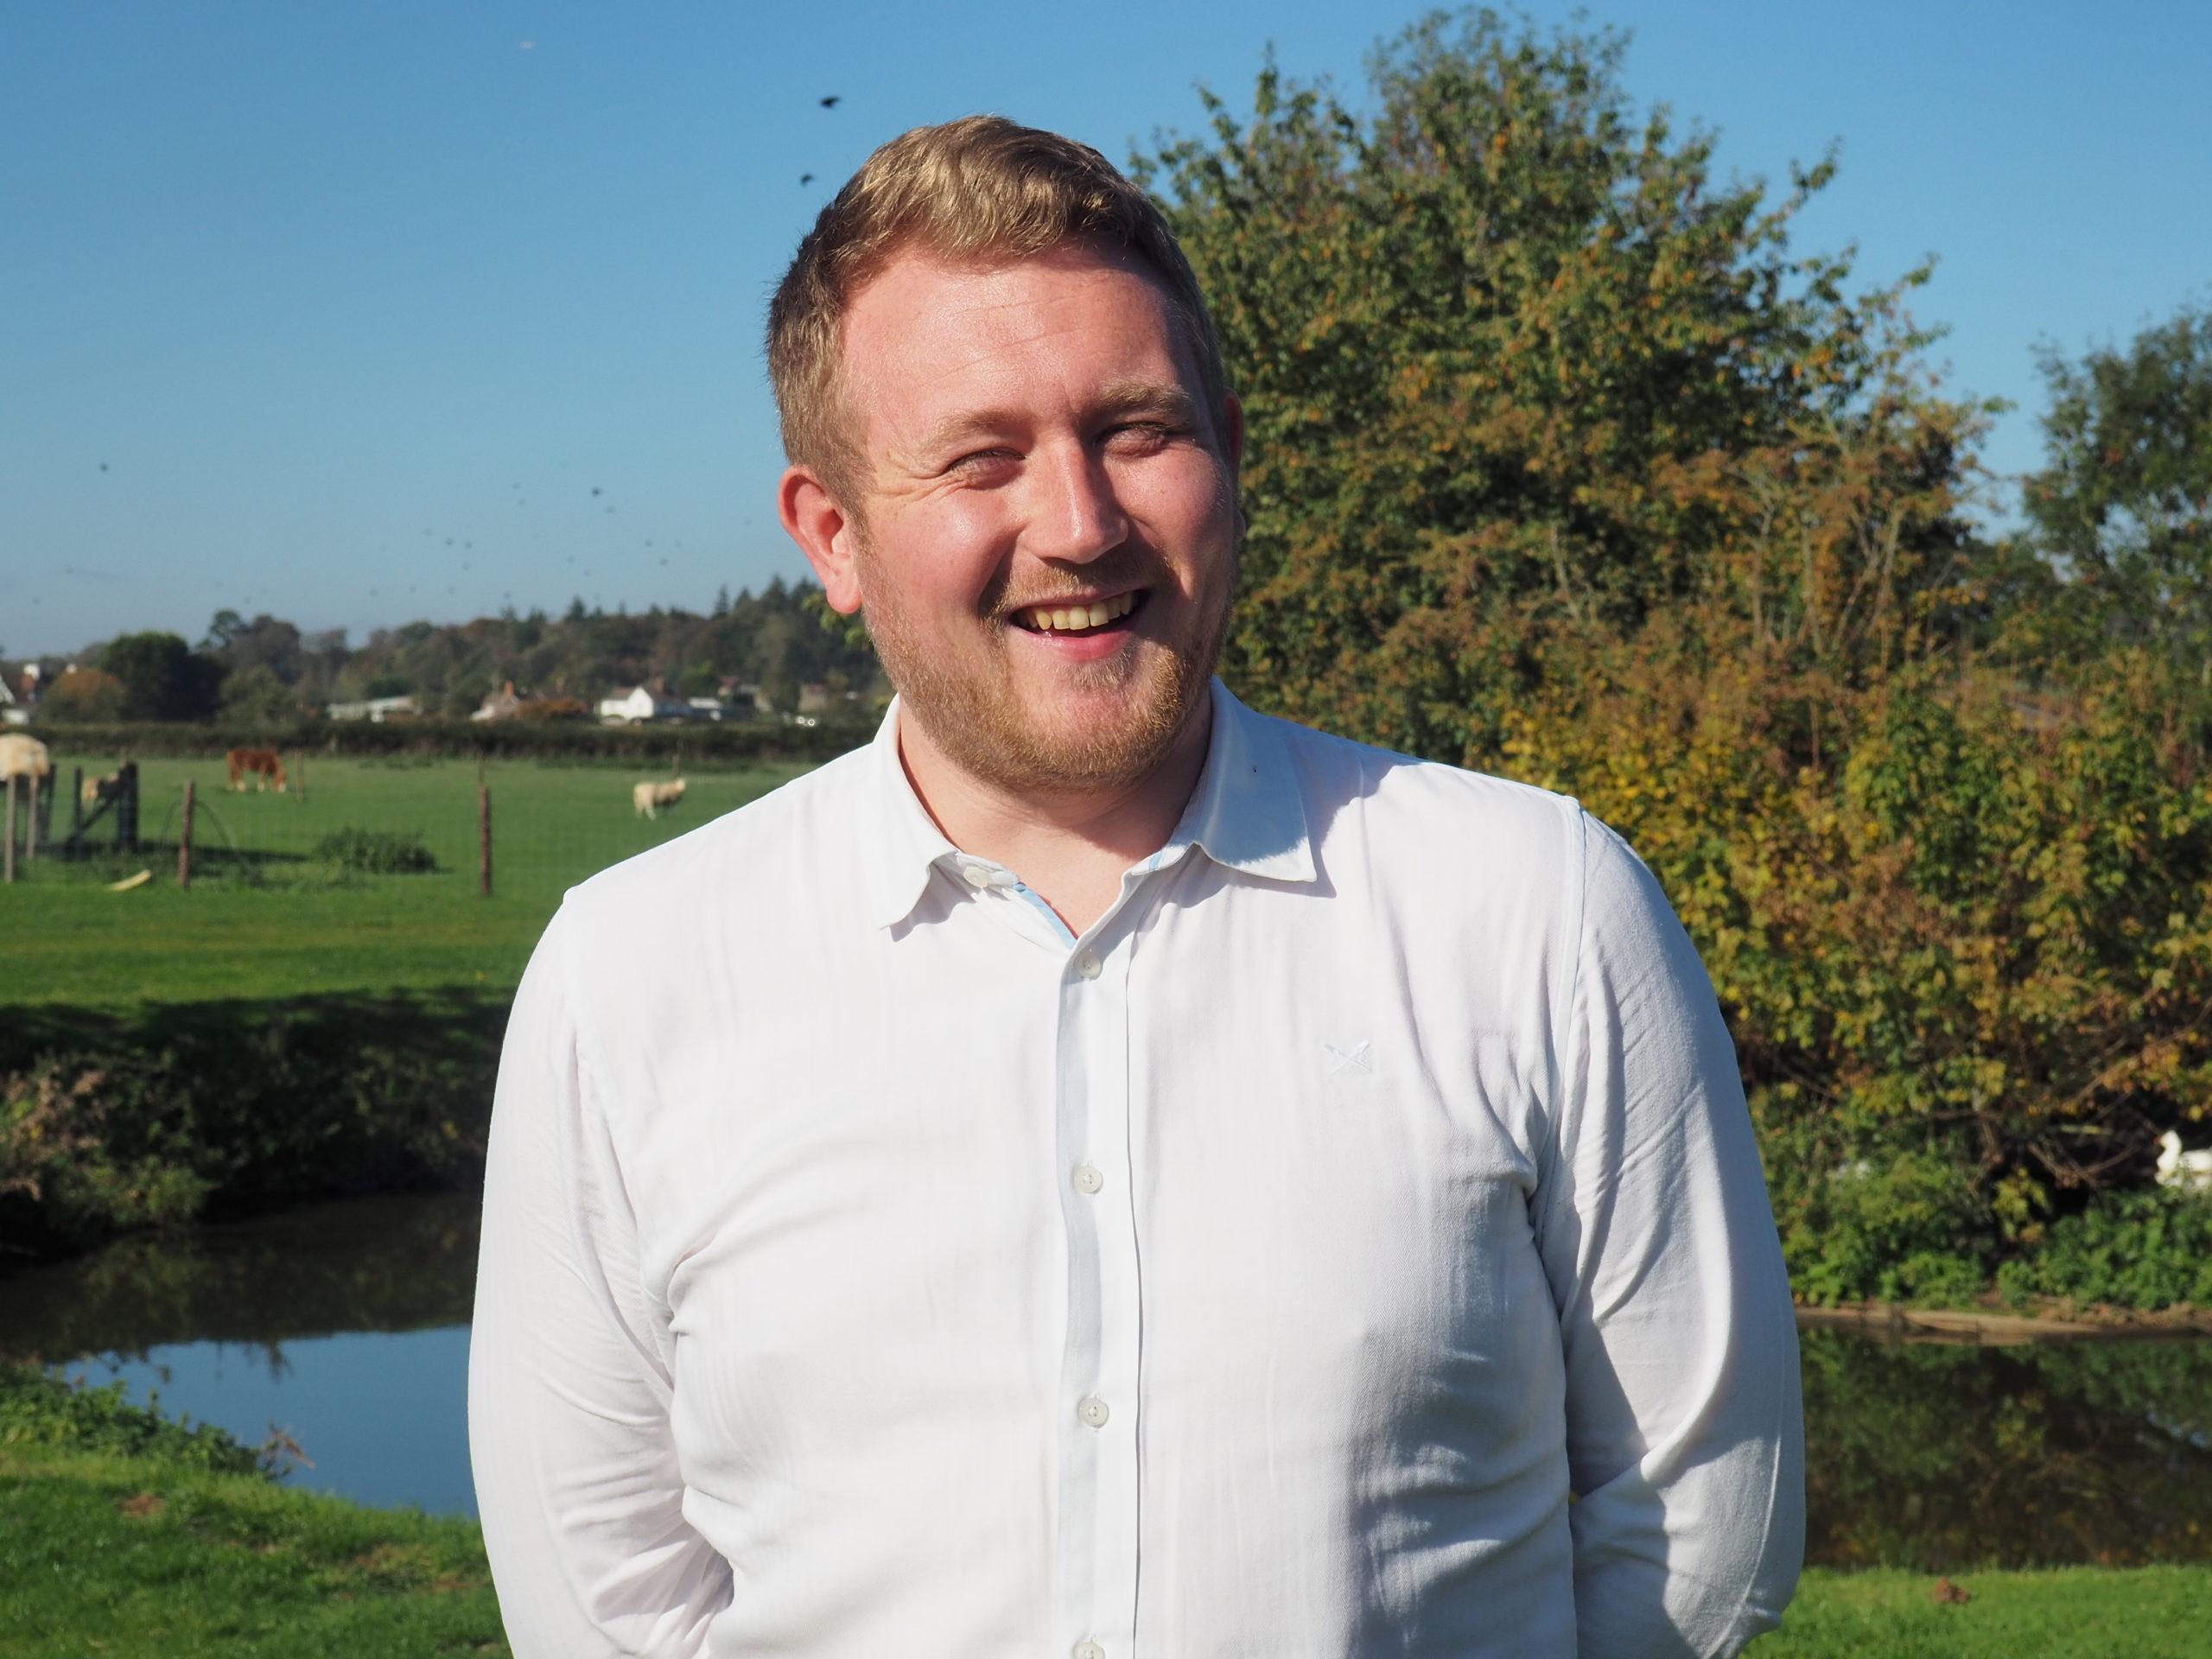 MEMBER PRESS RELEASE: New Food Waste Plan Offers Renewable Energy Opportunities In Scotland